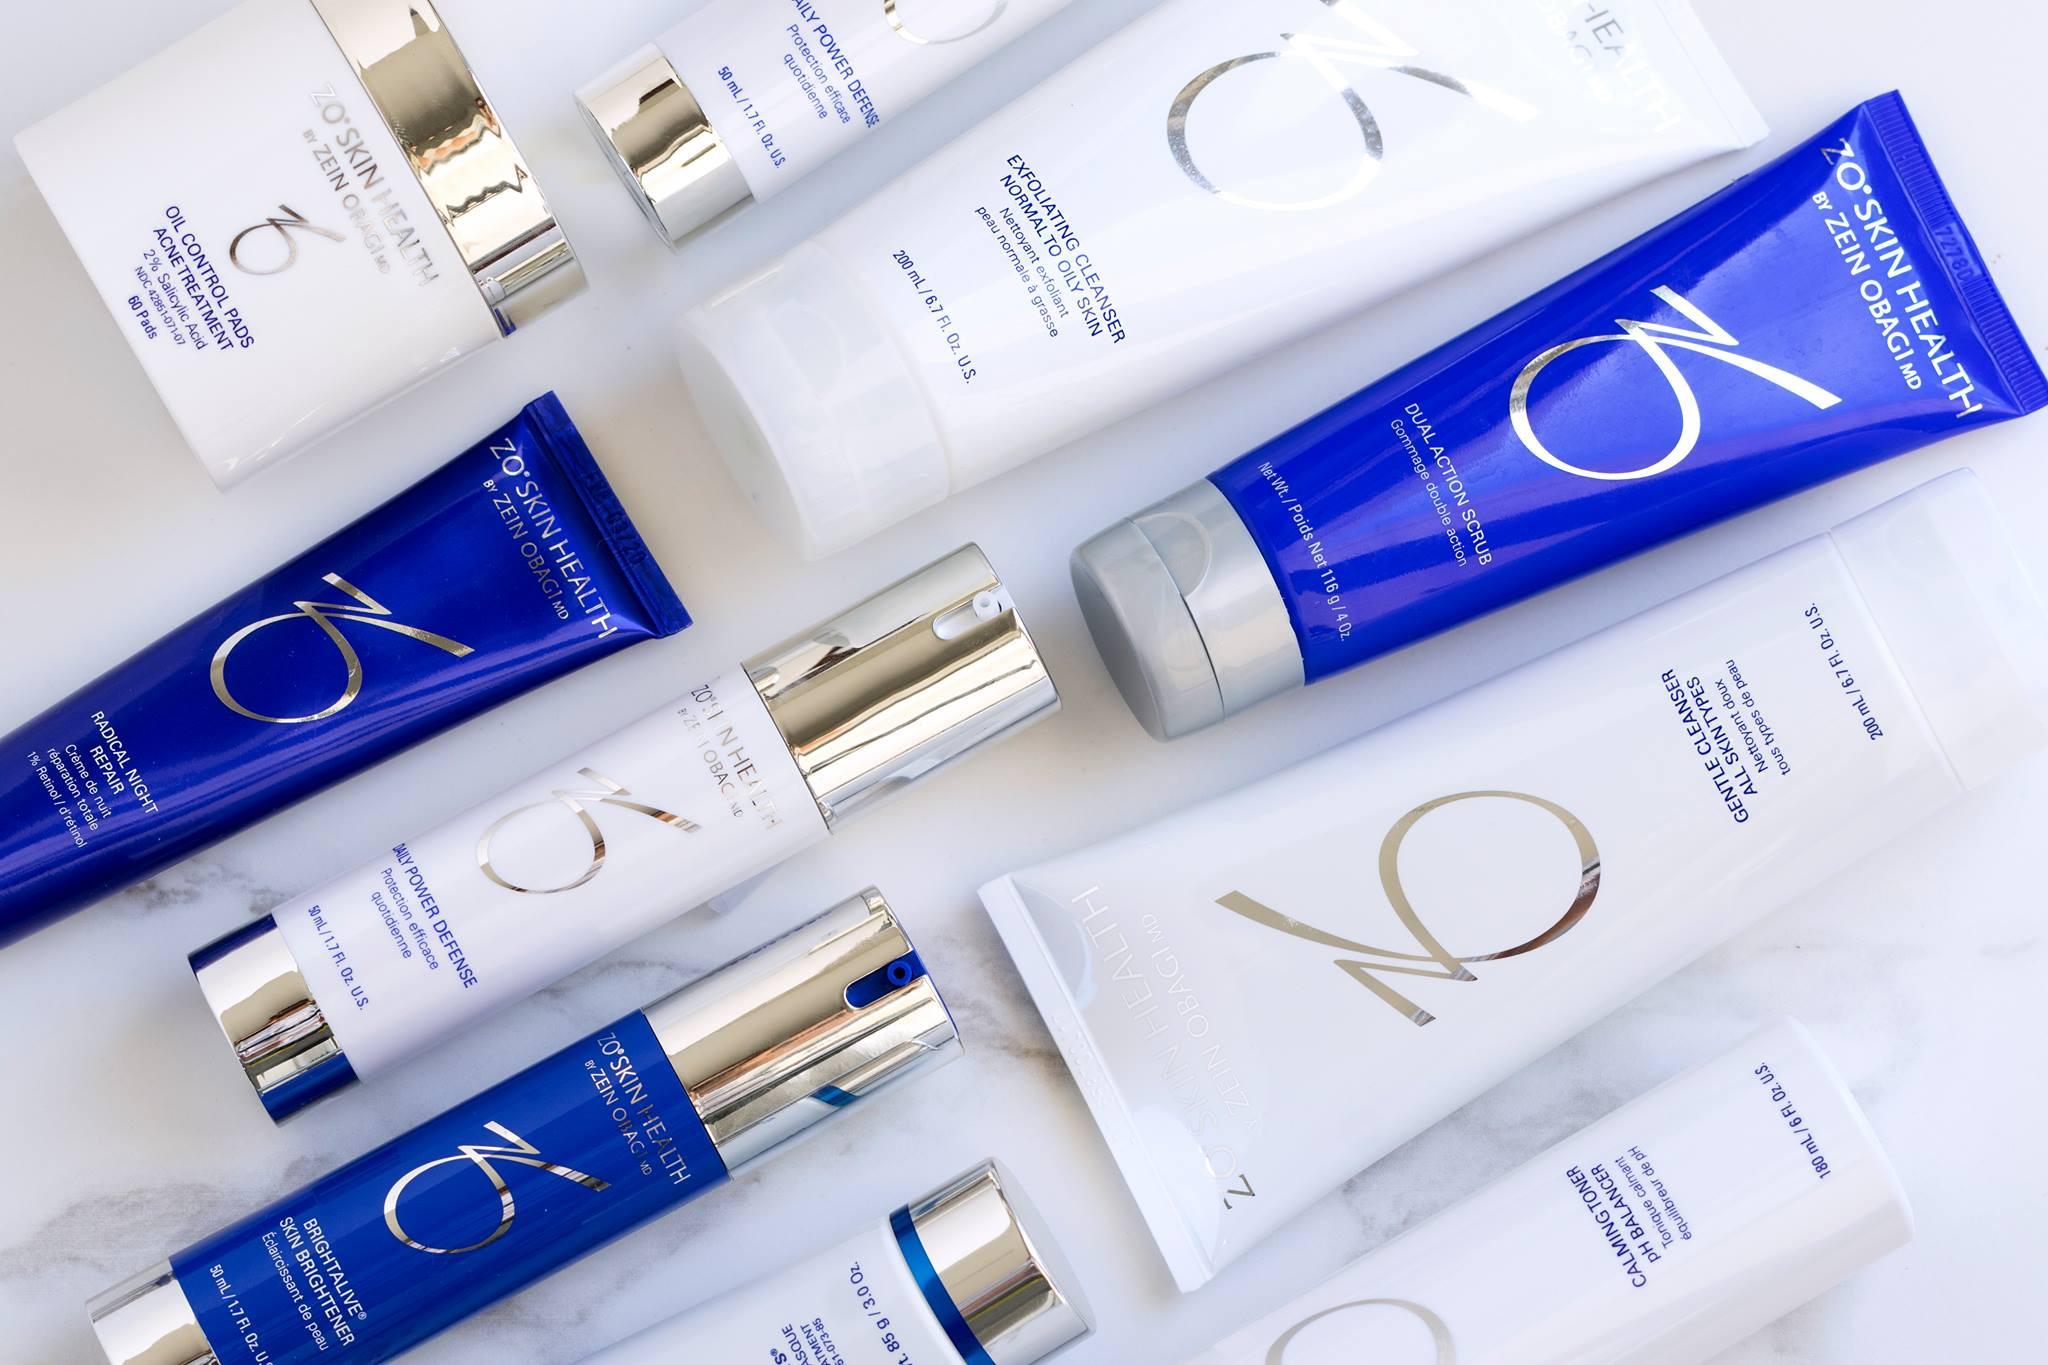 ZO Skin Consultation